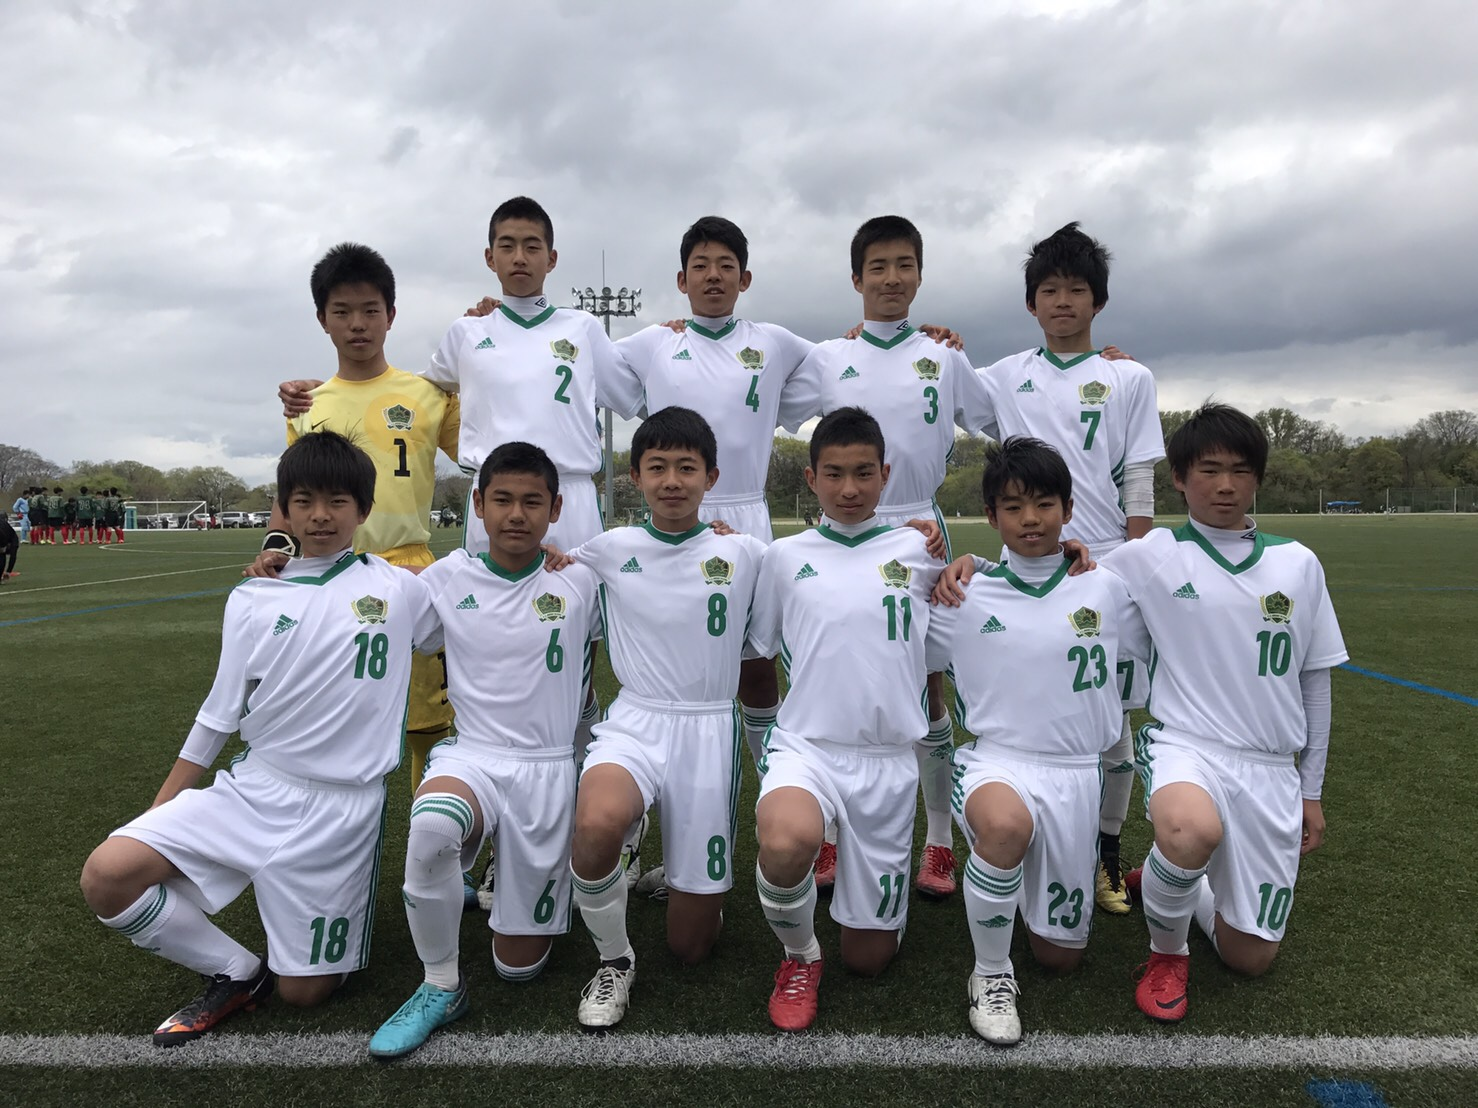 FCオリベ多治見ジュニアユースAチーム 2018年度岐阜県U15リーグ1部試合結果